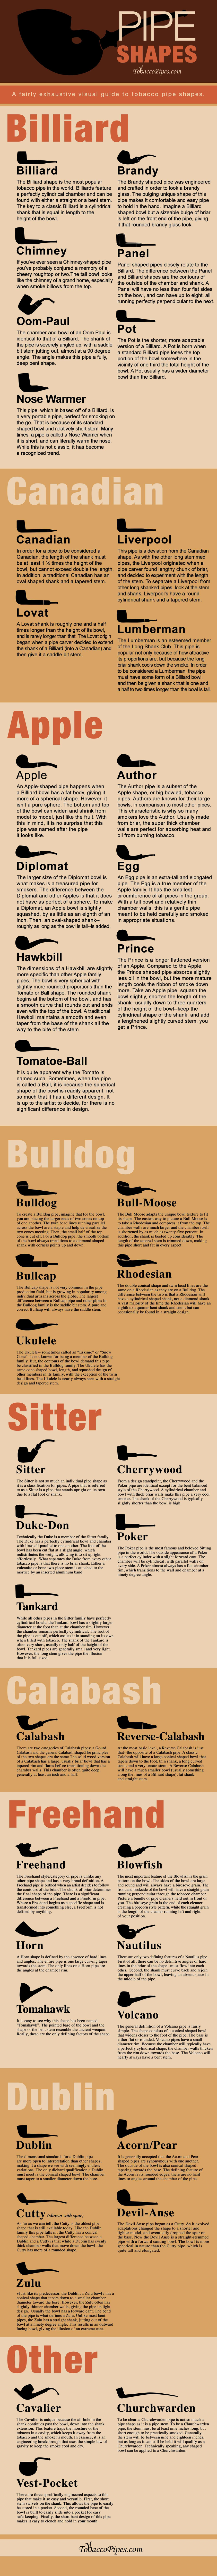 Tobacco Pipe Shape Guide